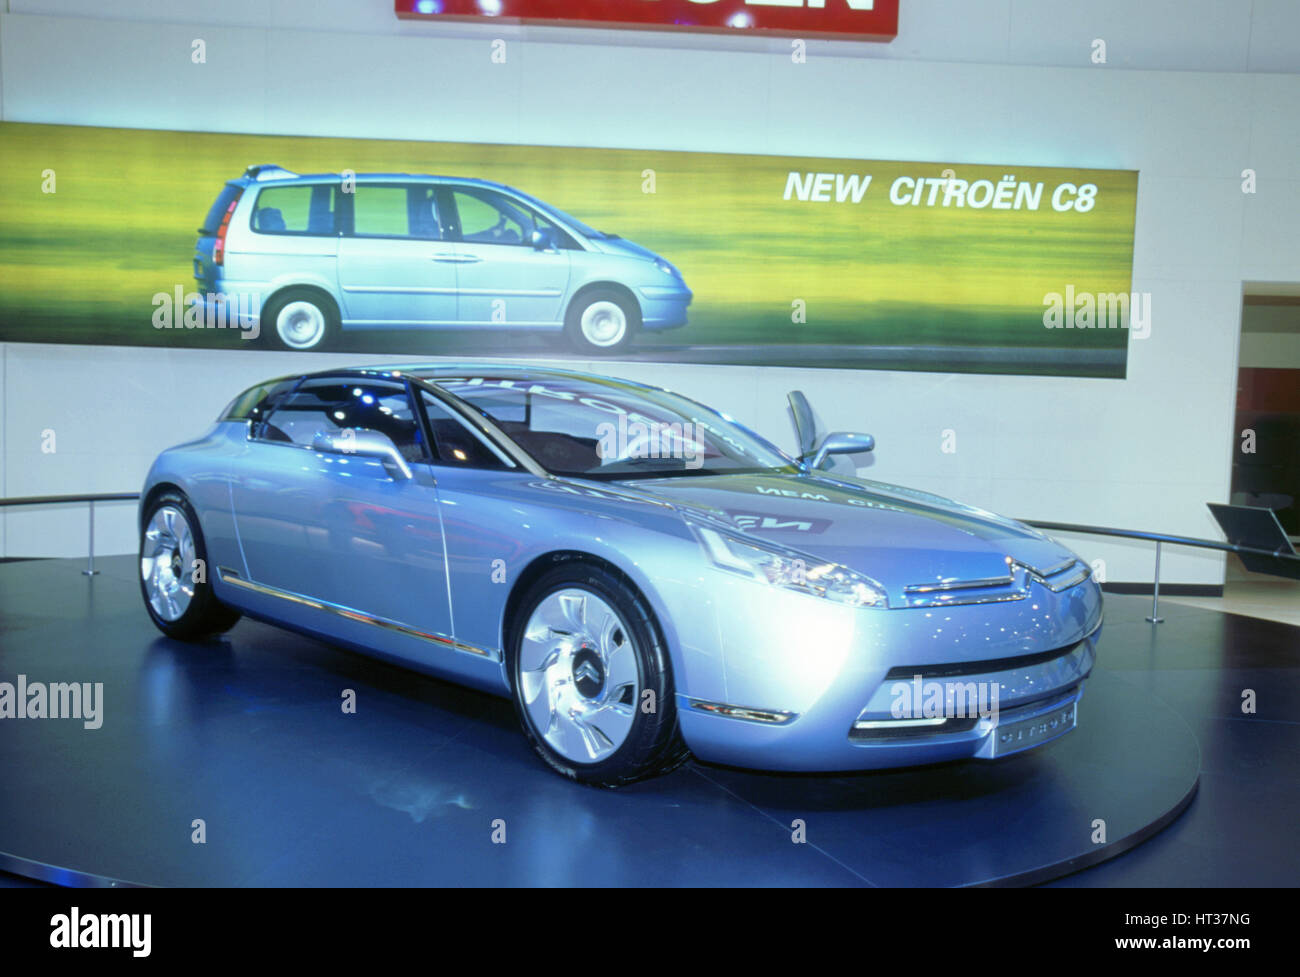 2002 Citroen C-Airdream concept car. Artista: sconosciuto. Immagini Stock